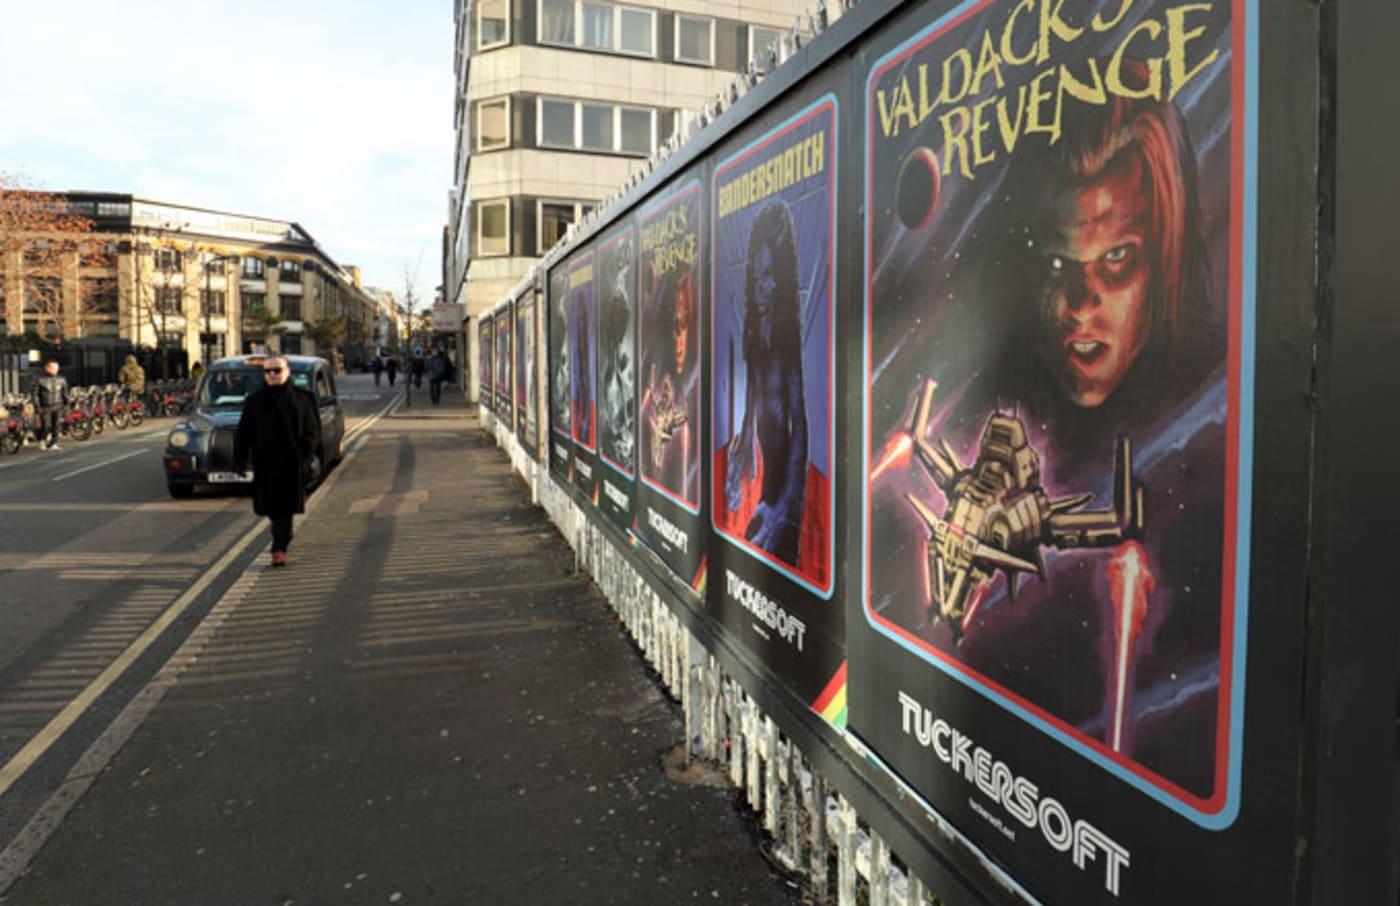 A 'Black Mirror: Bandersnatch' pop up shop.